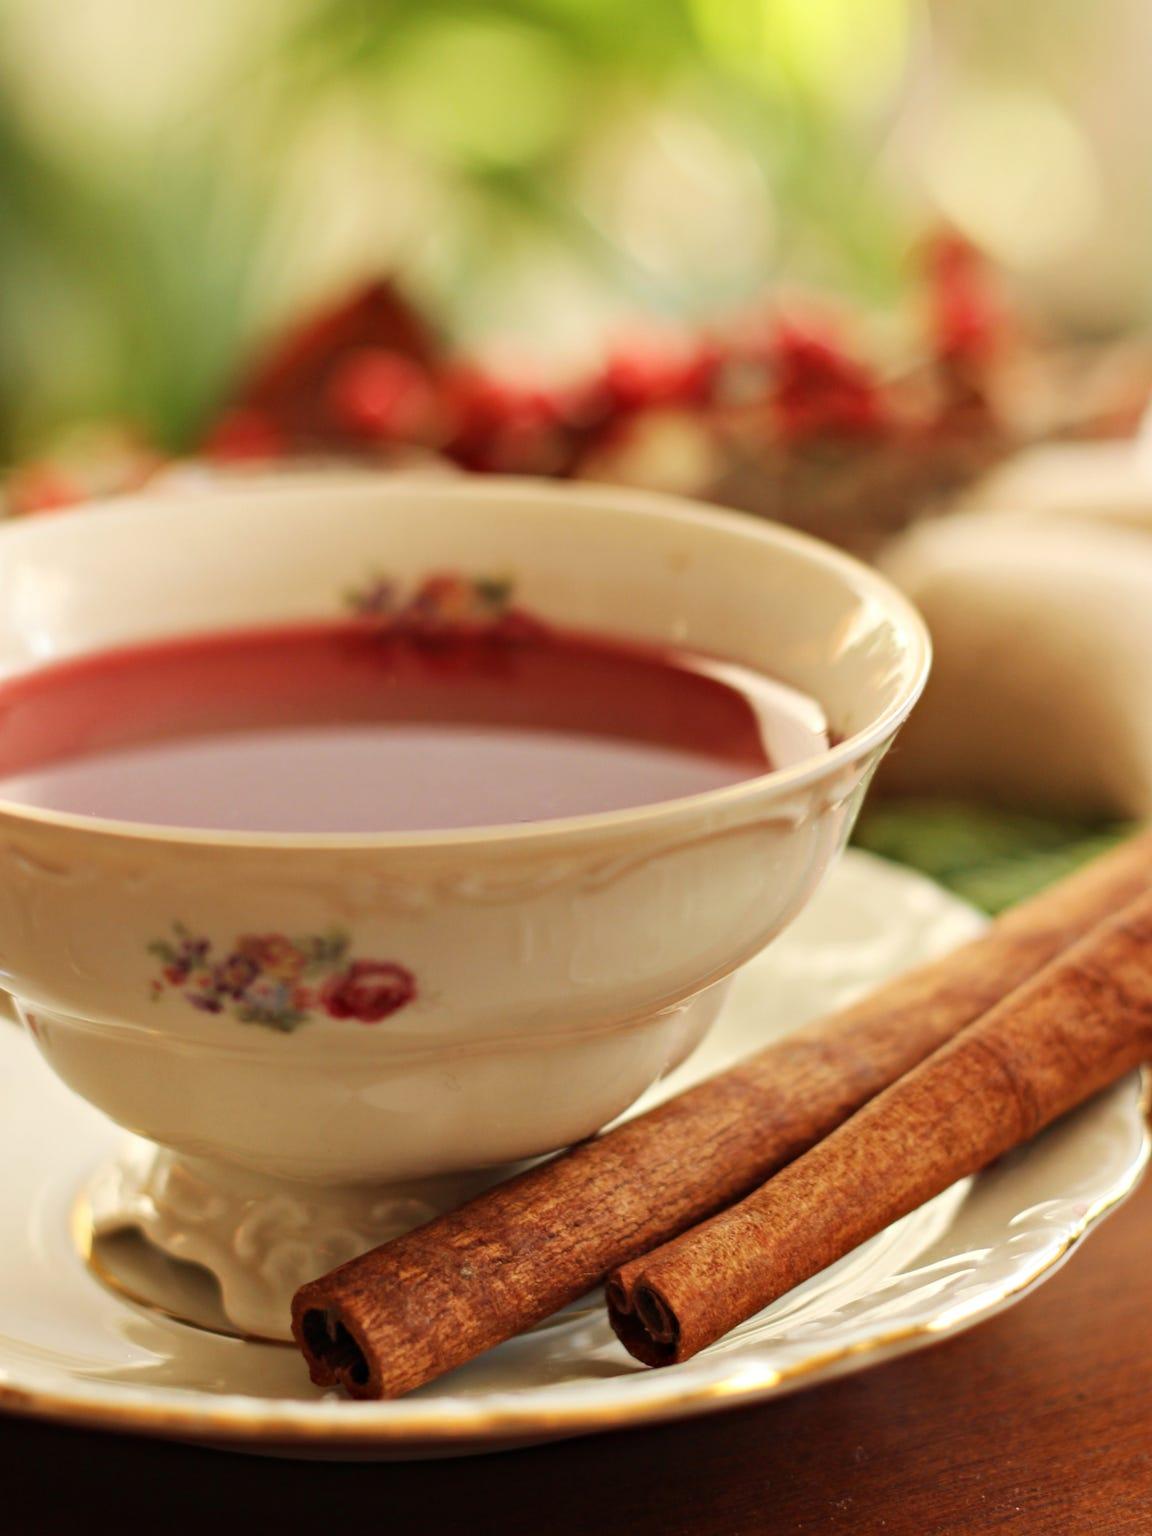 Enjoy tea in a historic Victorian setting at Sam Davis Home.